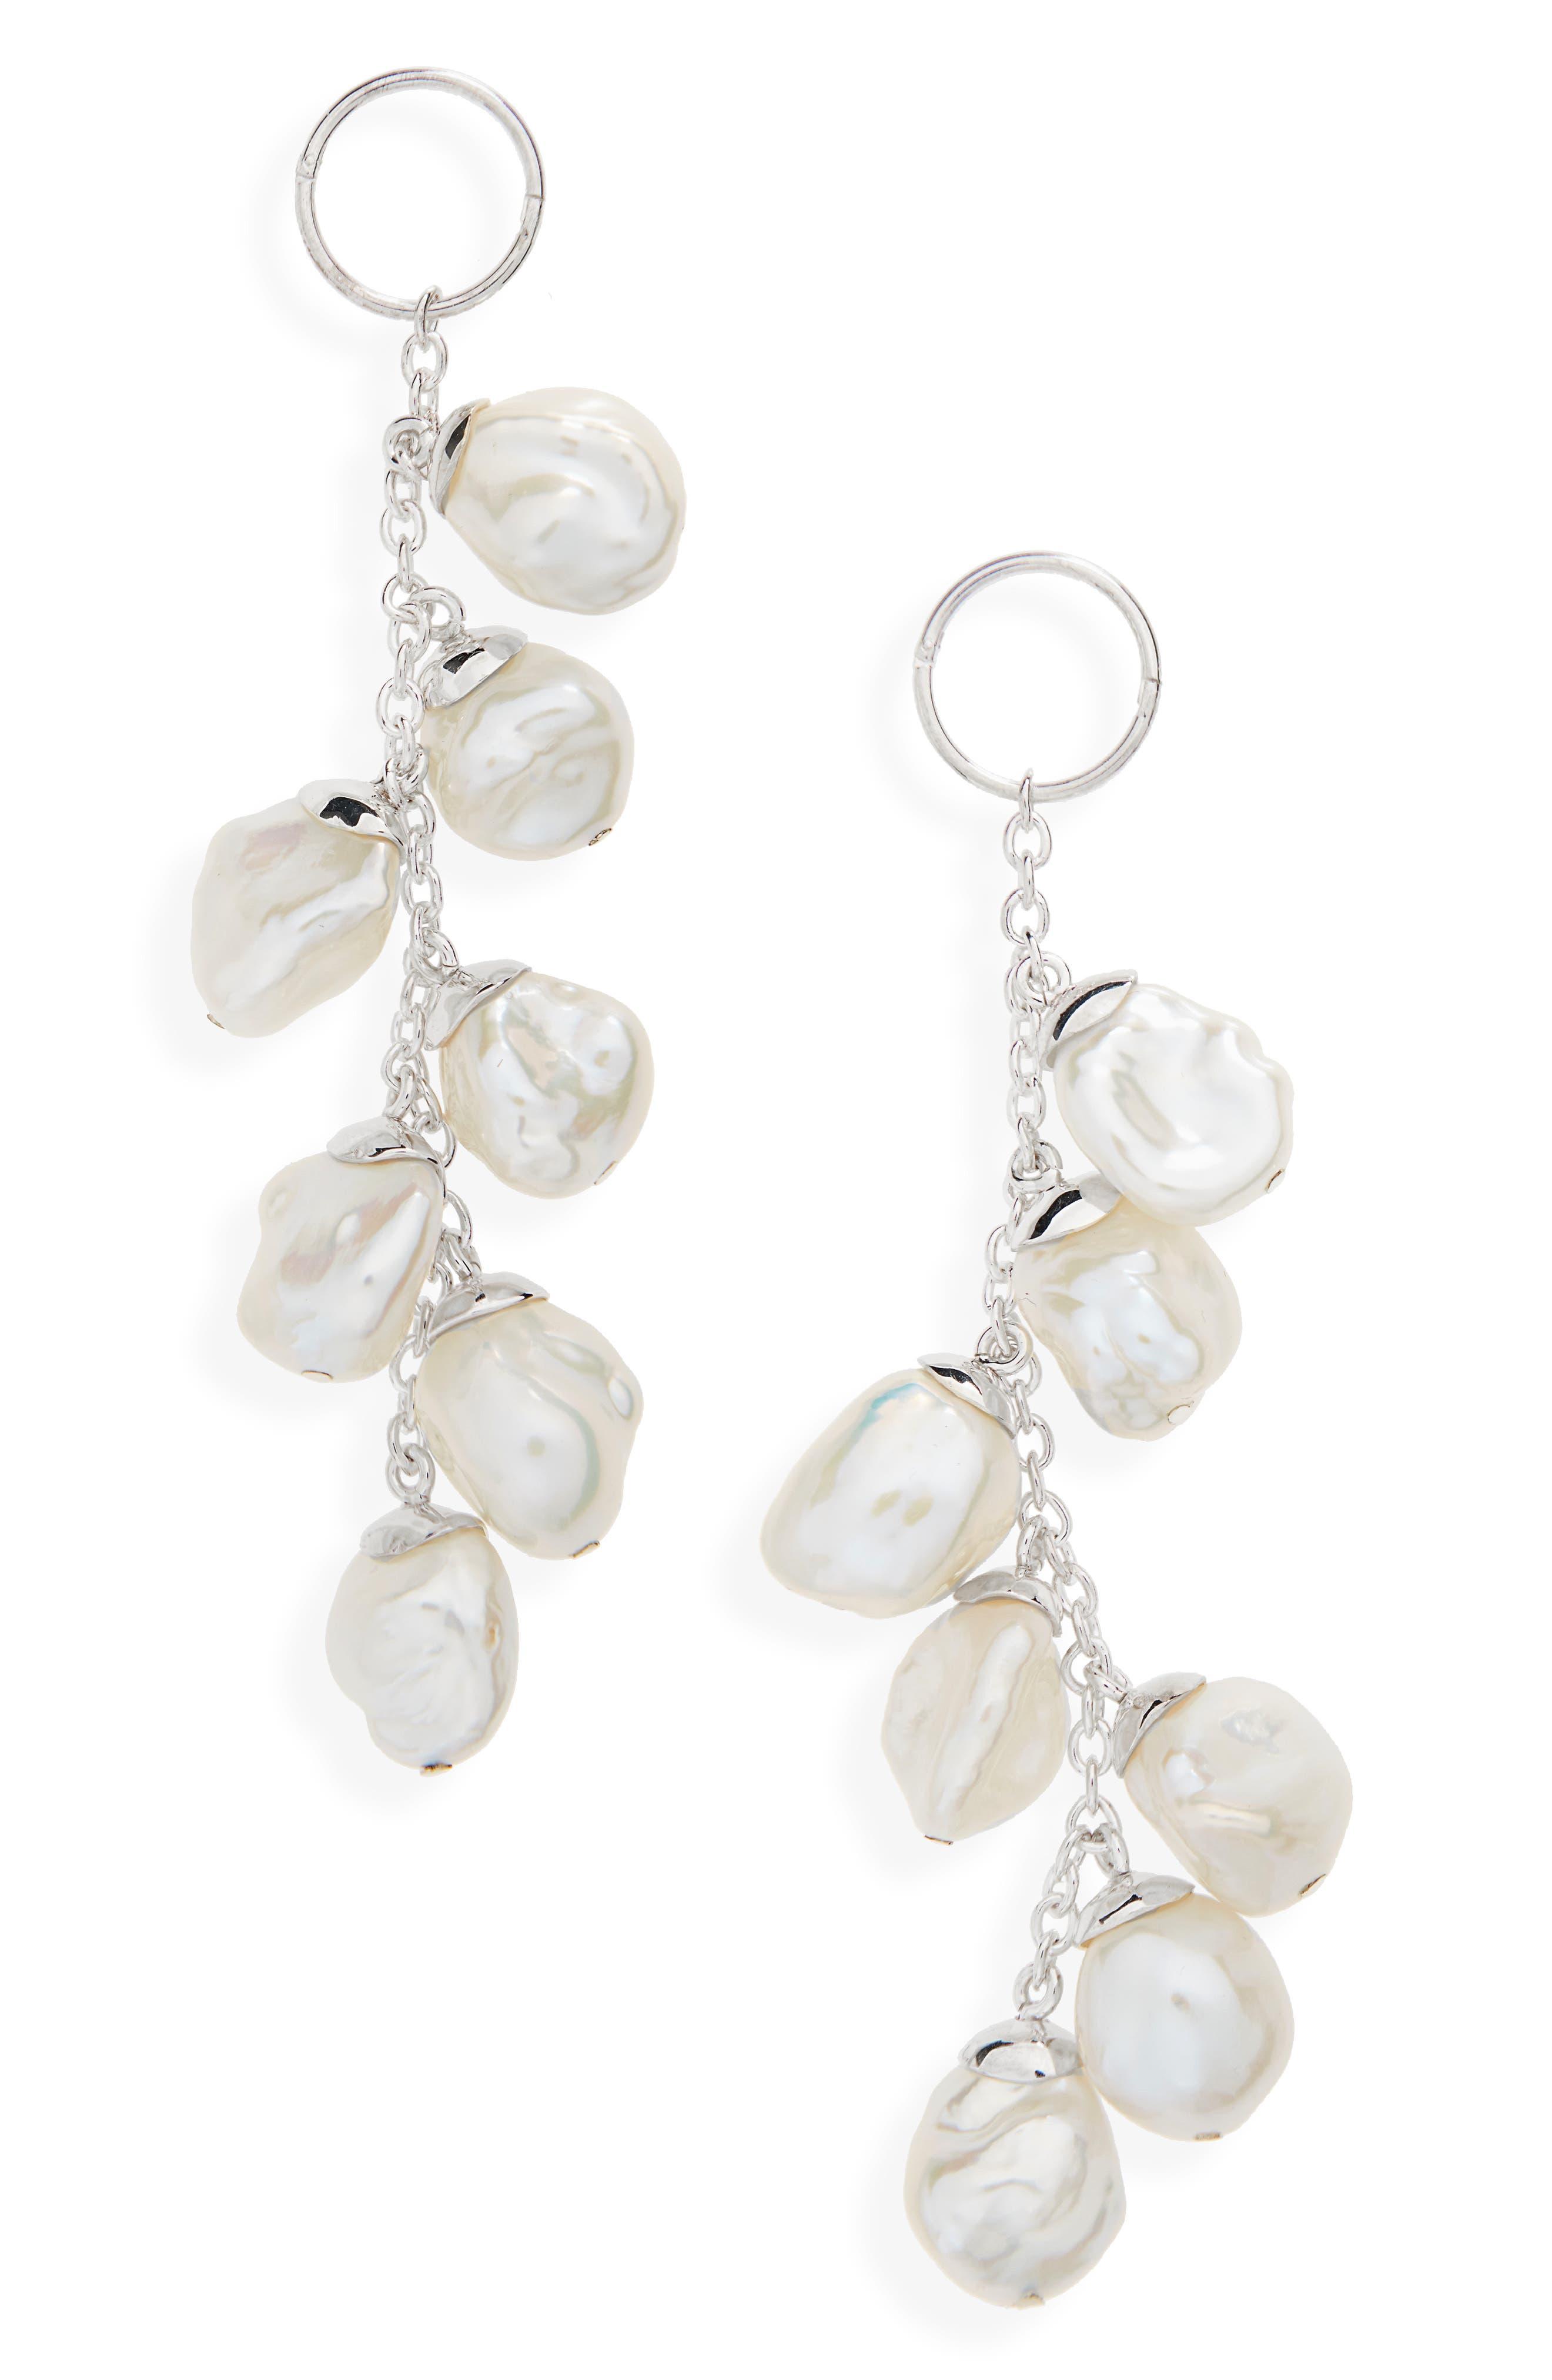 Main Image - Meadowlark Baroque Cultured Freshwater Pearl Drop Earrings